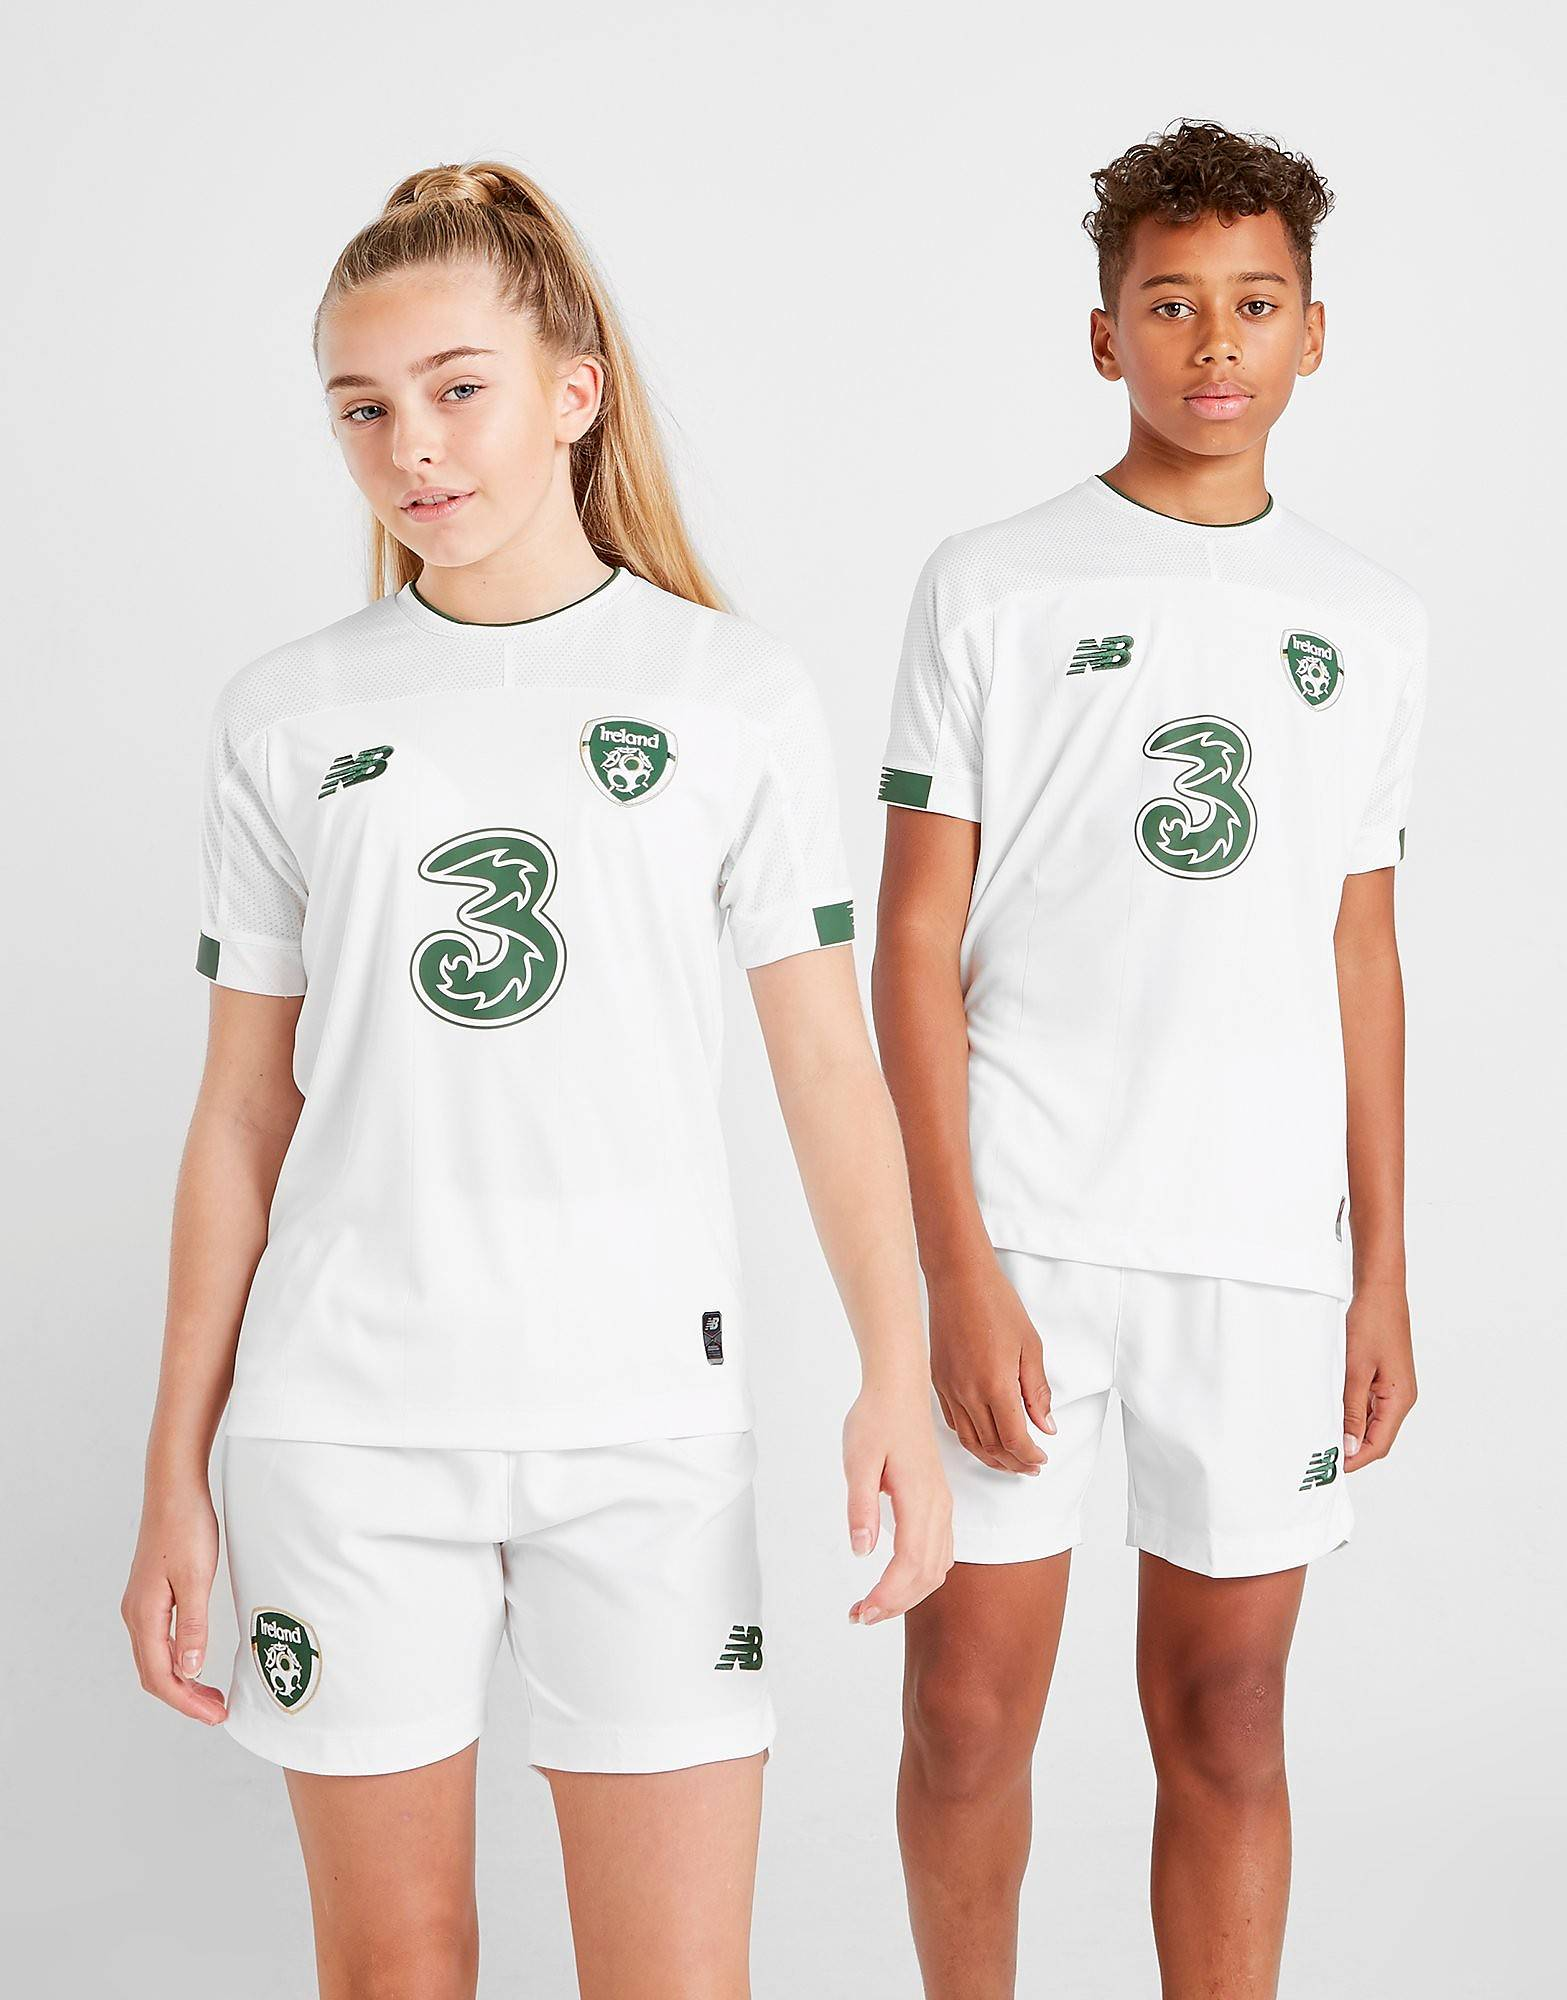 Image of New Balance Republic of Ireland 2019/20 Away Shirt Junior - Kids, Valkoinen